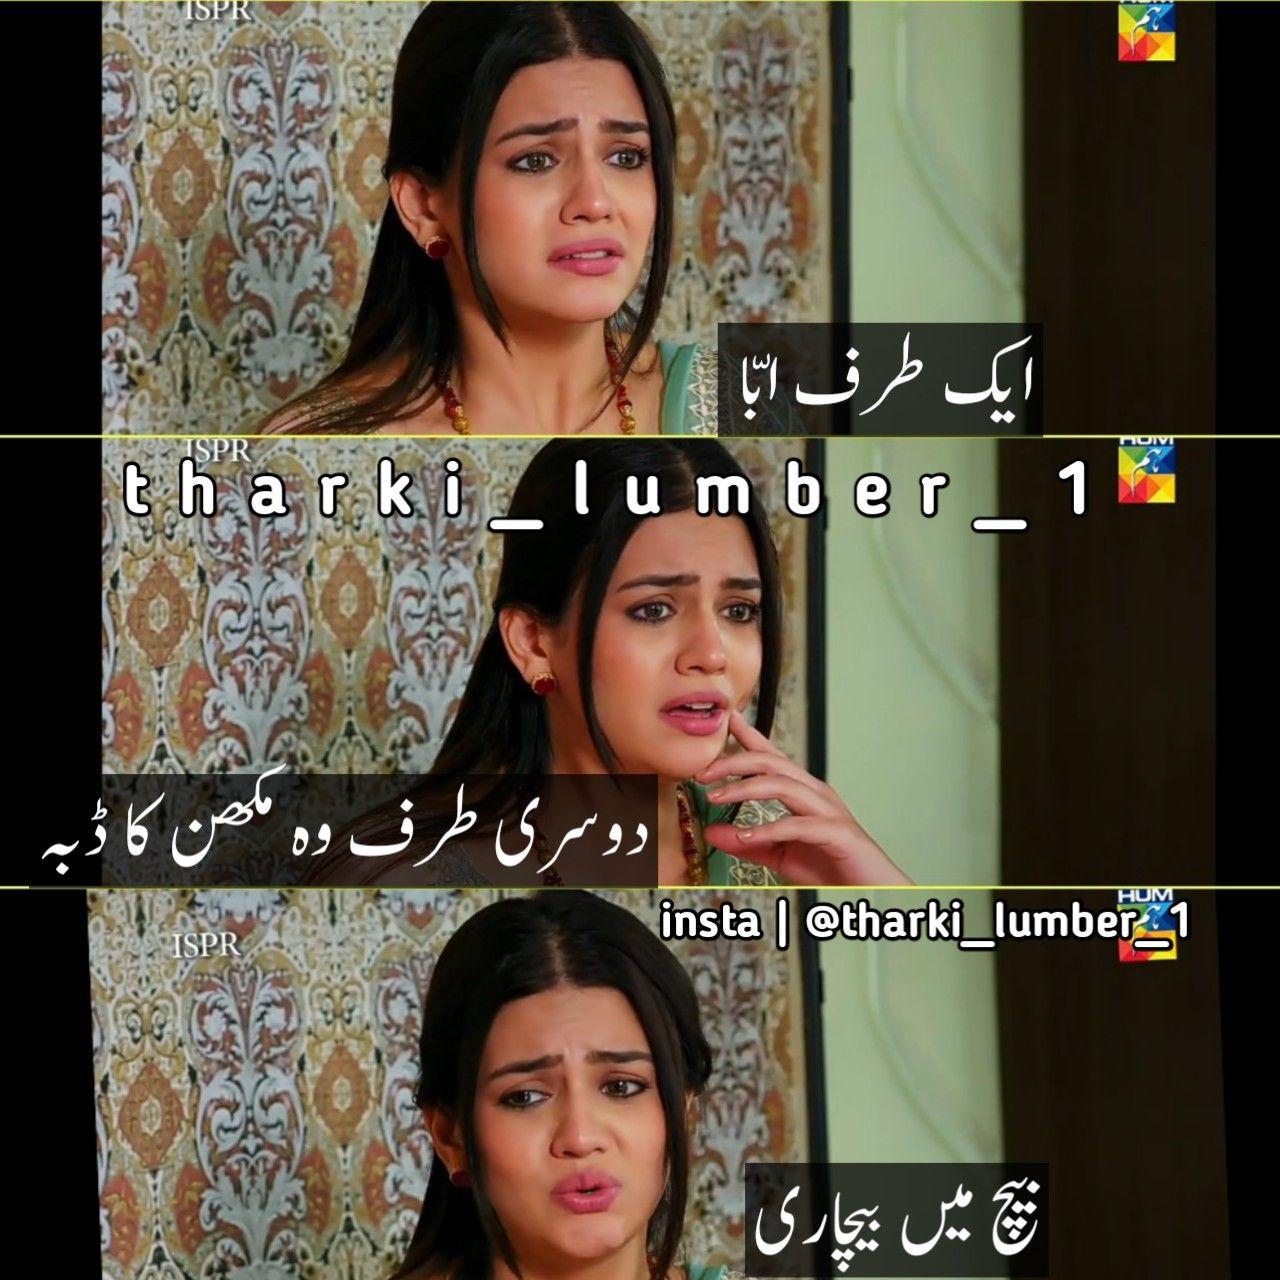 Ehd E Wafa Funny Meme Birthday Quotes For Me Funny Memes Funny Jokes